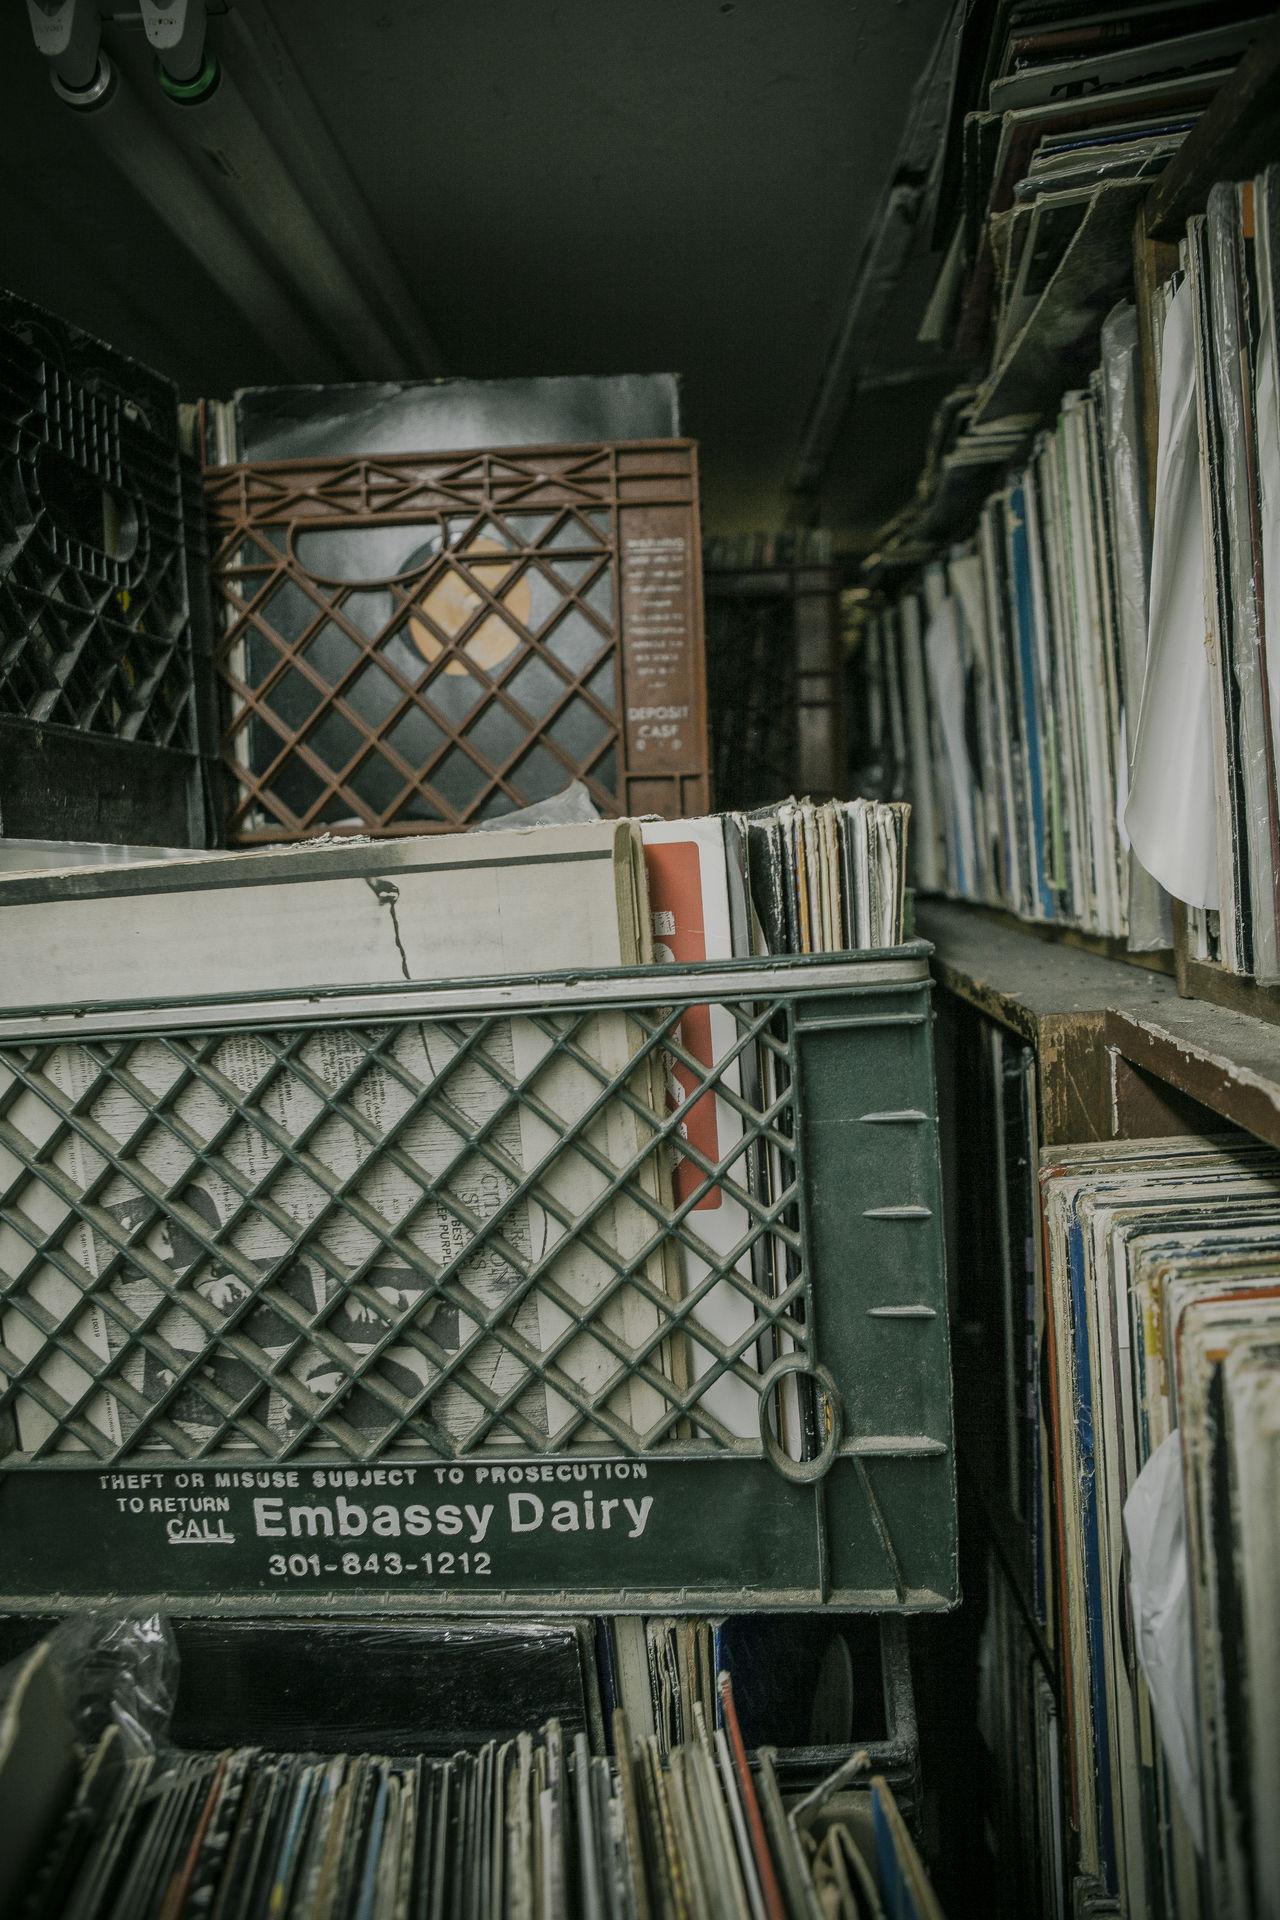 Arrangement Basement Bookshelf Box Boxes Collection Dark Graffiti Hip Hop HipHop Indoors  Large Group Of Objects Neon Lights New York City No People NYC Rap Records Recordstore Shelf Urban Vintage Vinyl